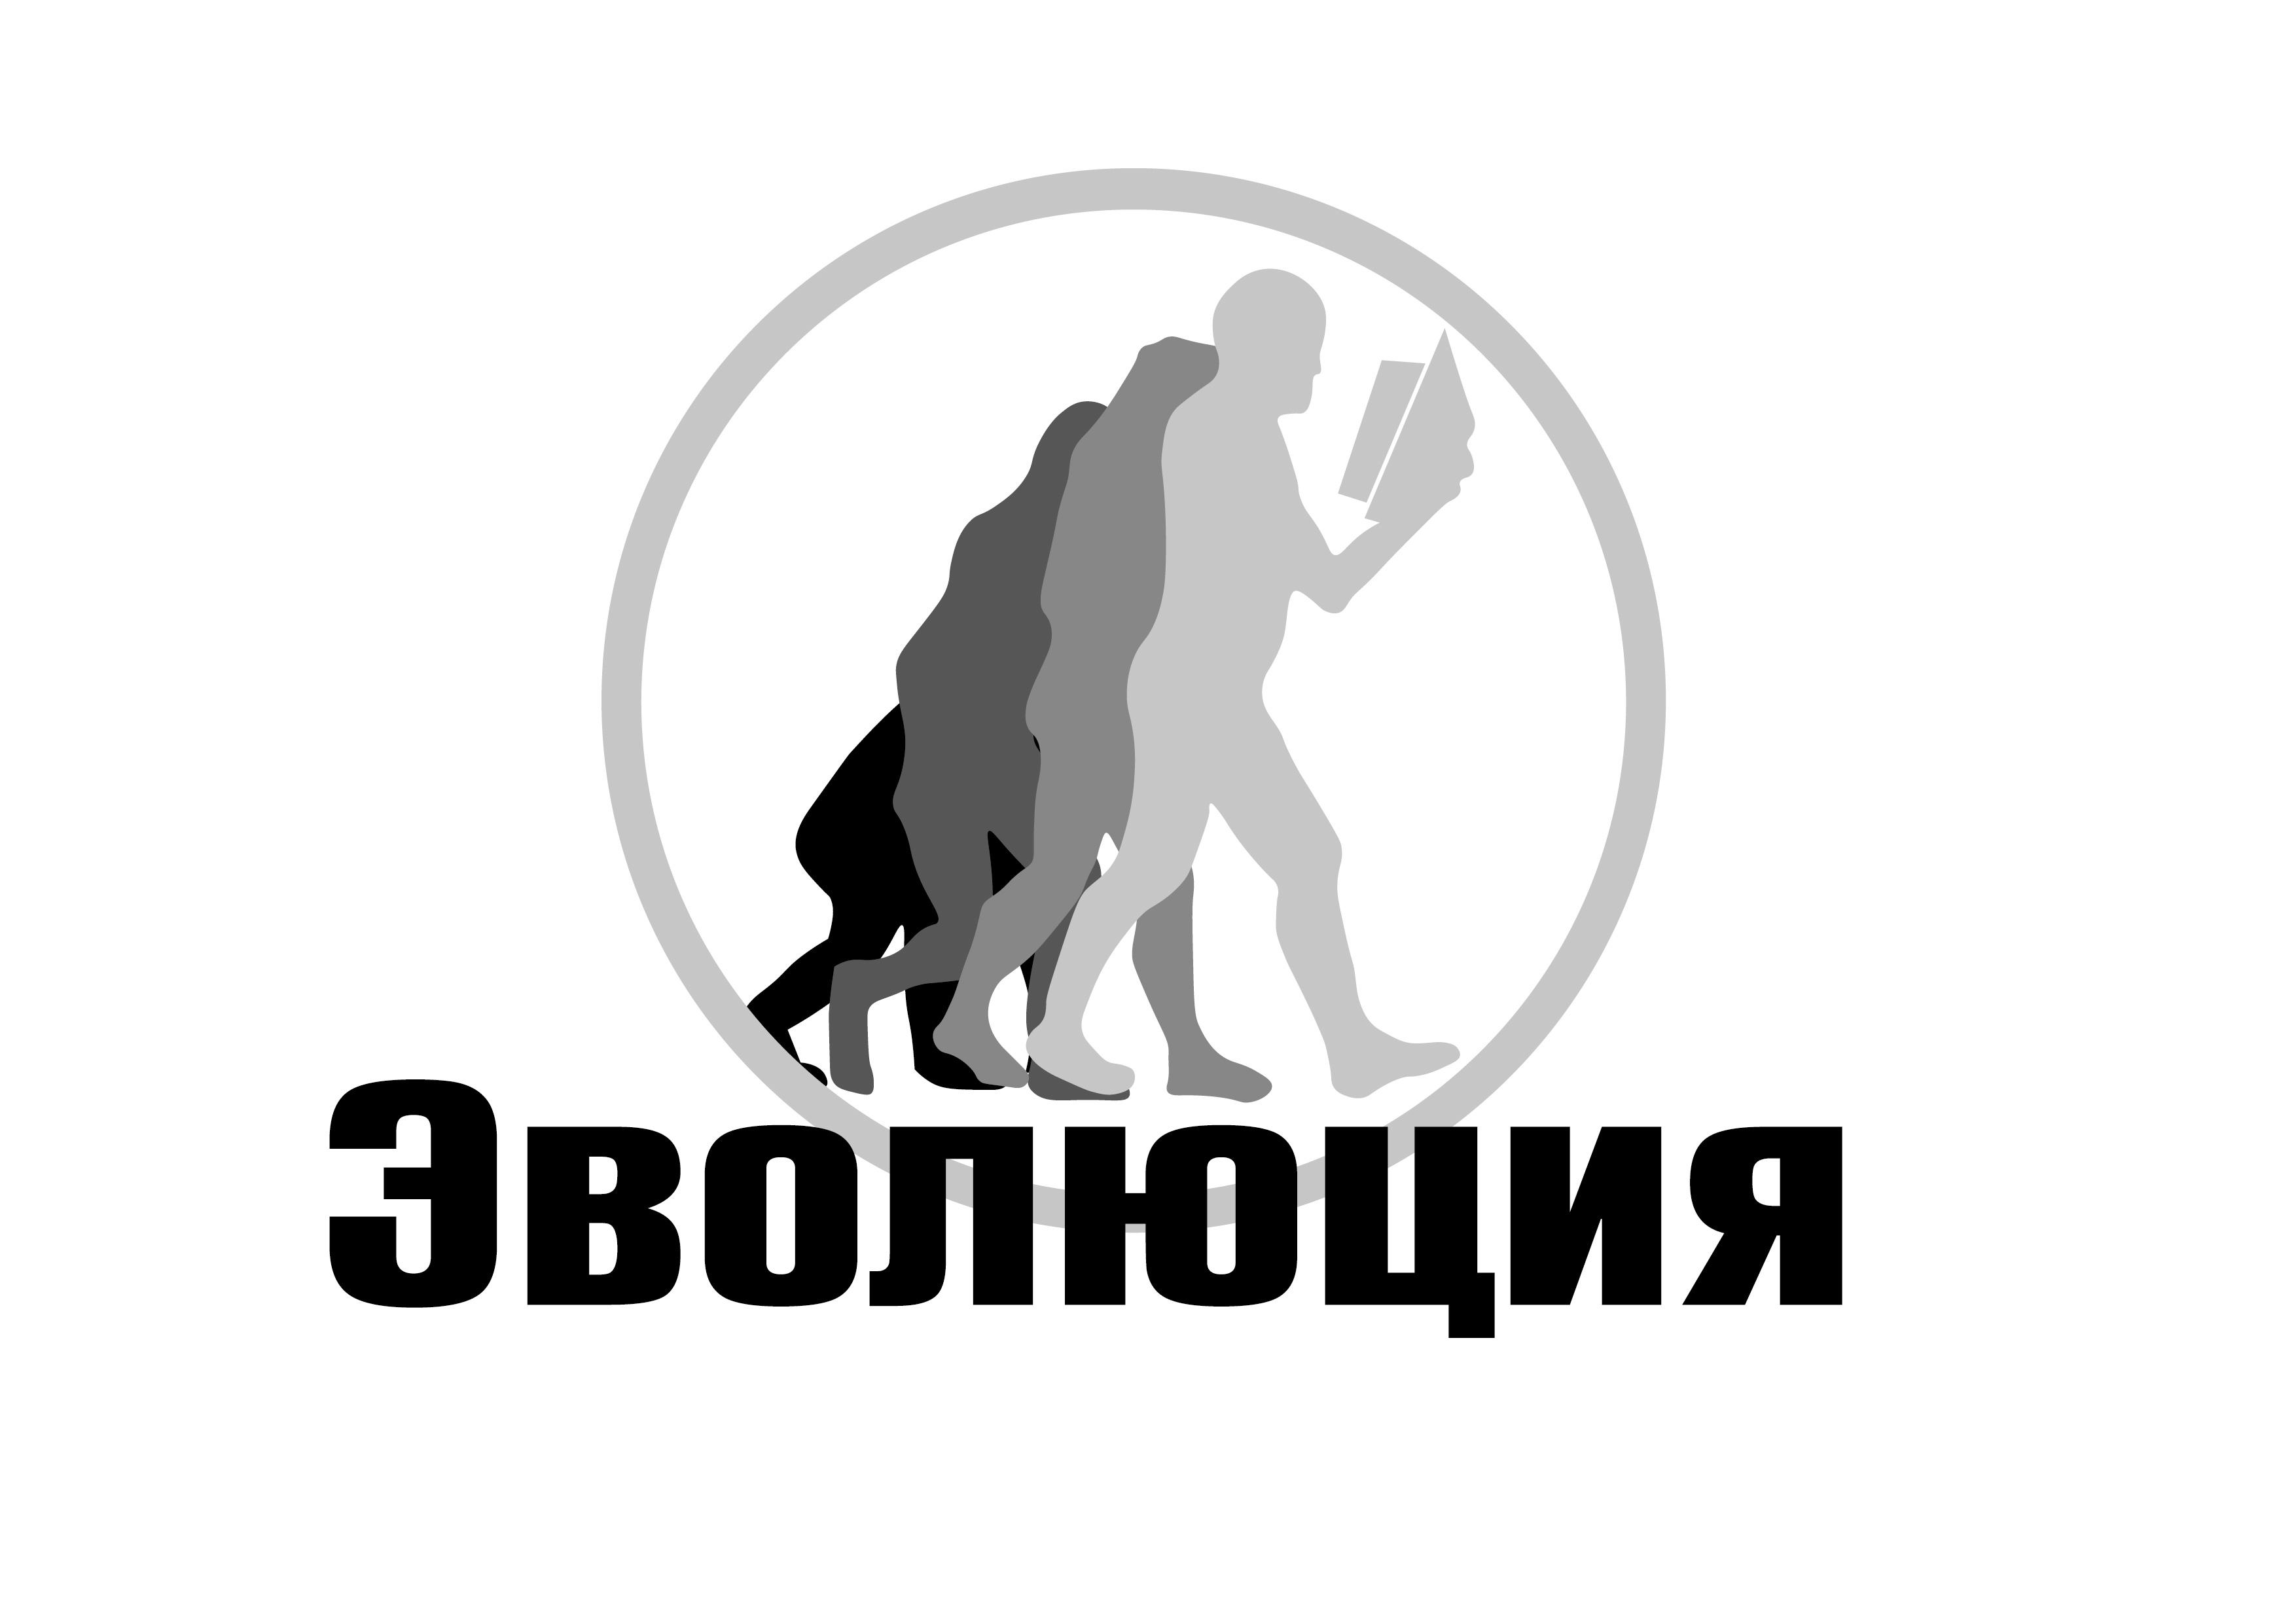 Разработать логотип для Онлайн-школы и сообщества фото f_3635bc49e248b84b.jpg